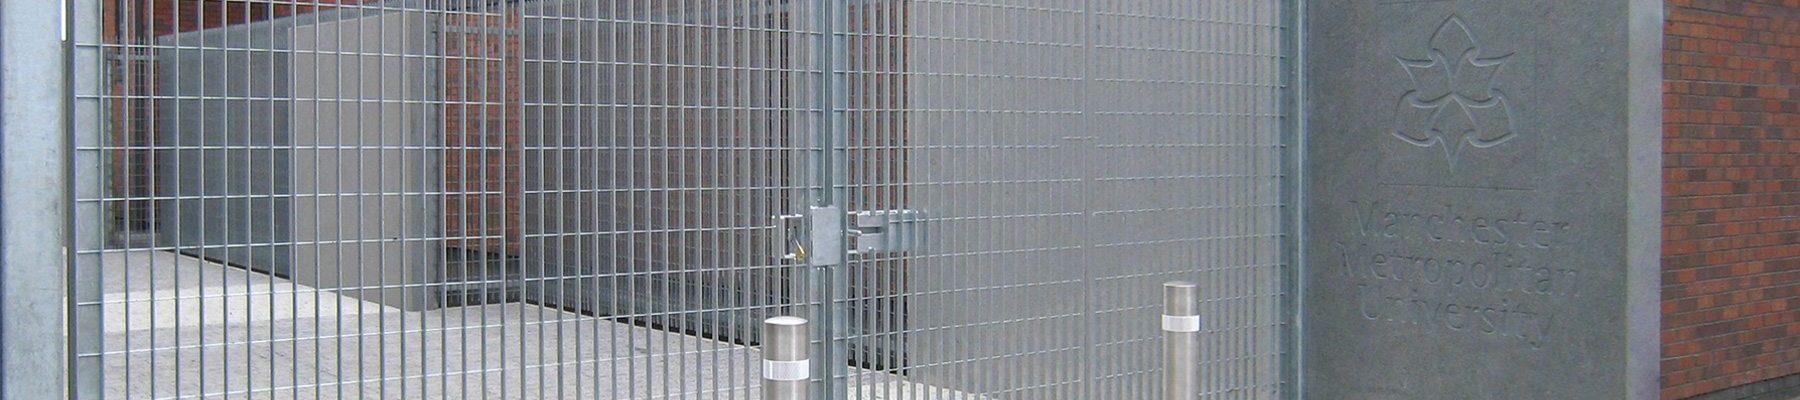 Banner-Customised-grating-fence-Como-Manchester-University